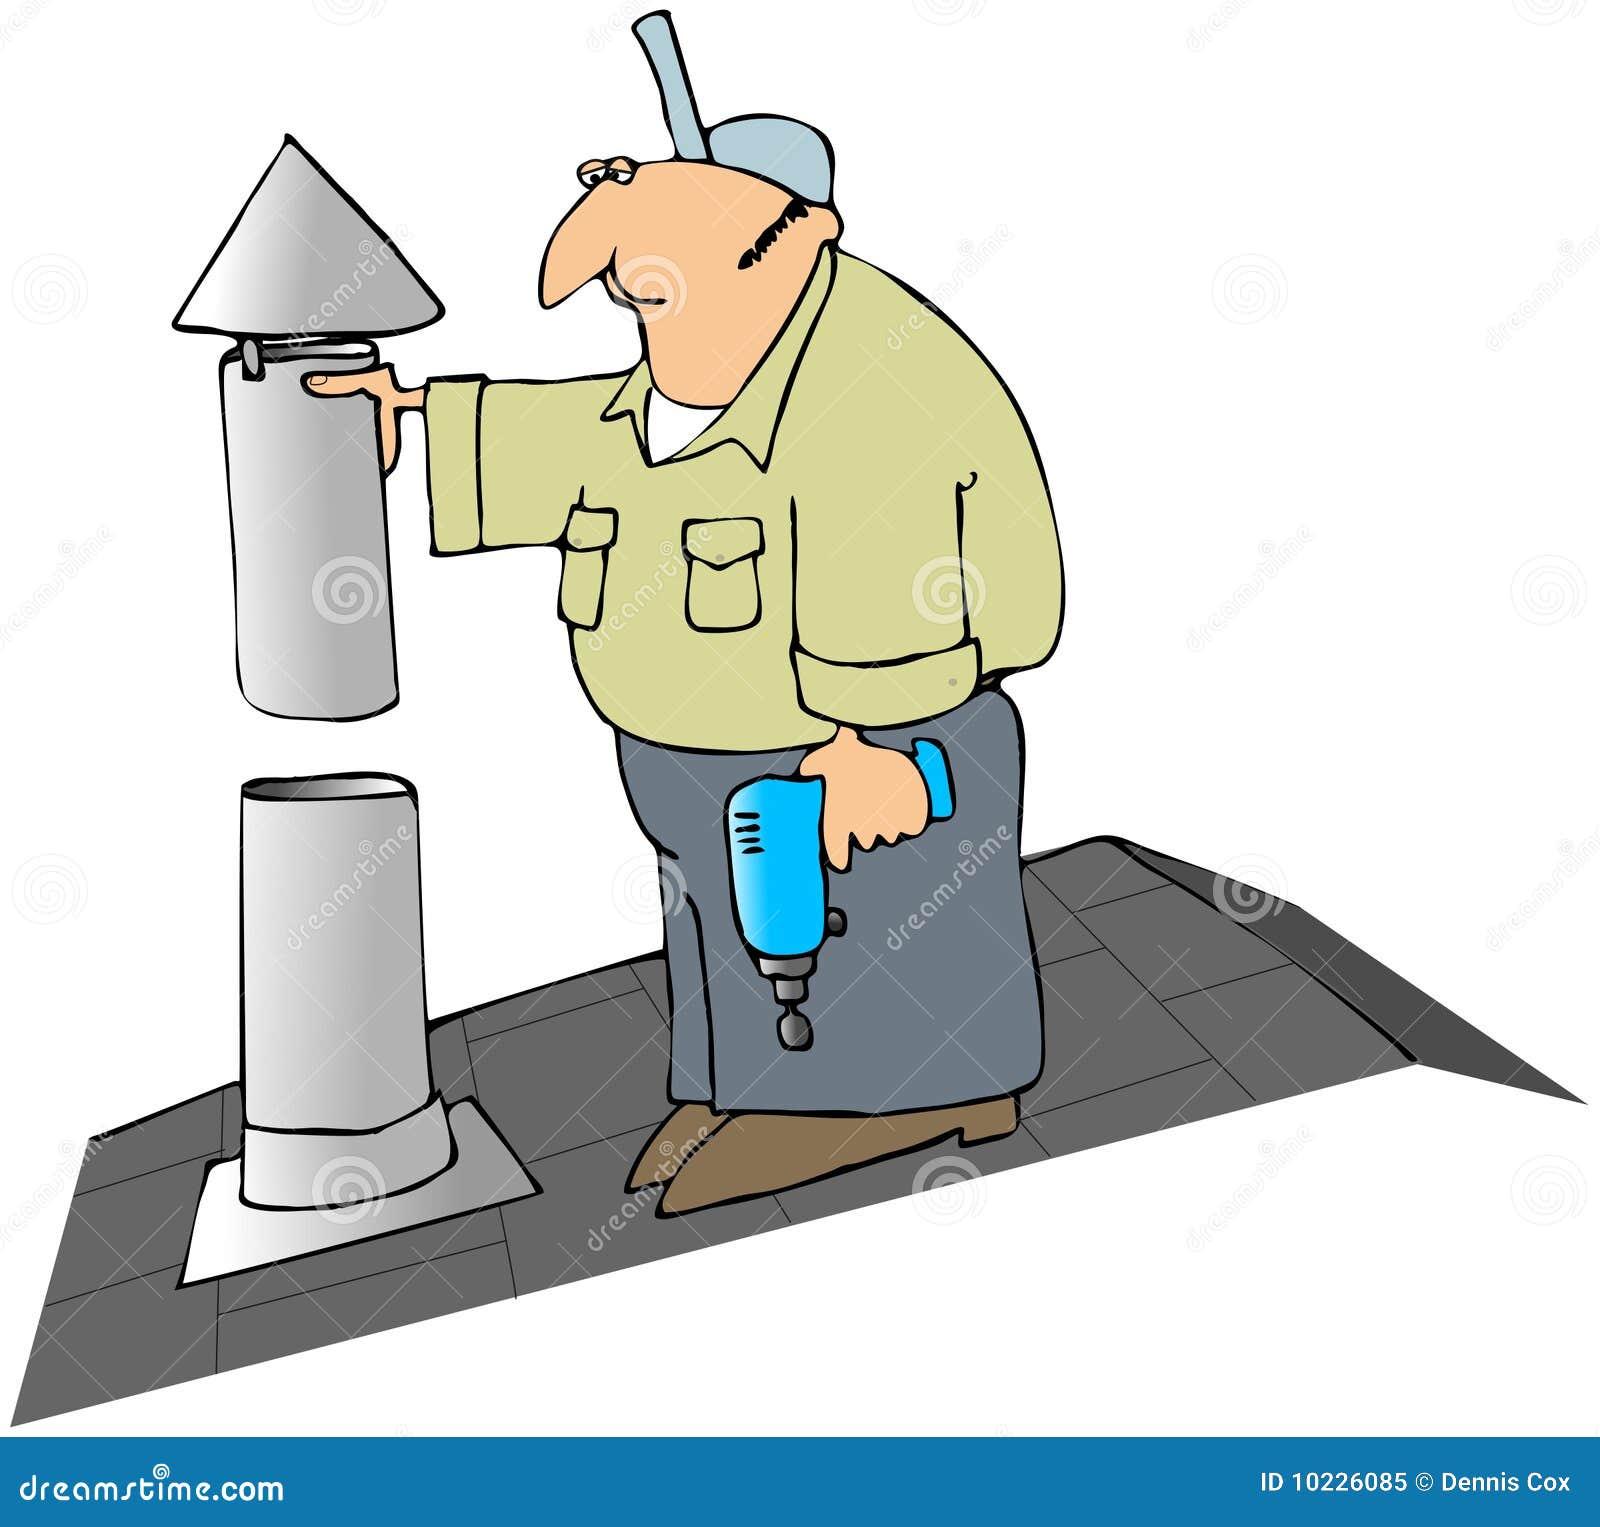 Cartoon Roofing Installation : Installing a furnace flue cap stock illustration image